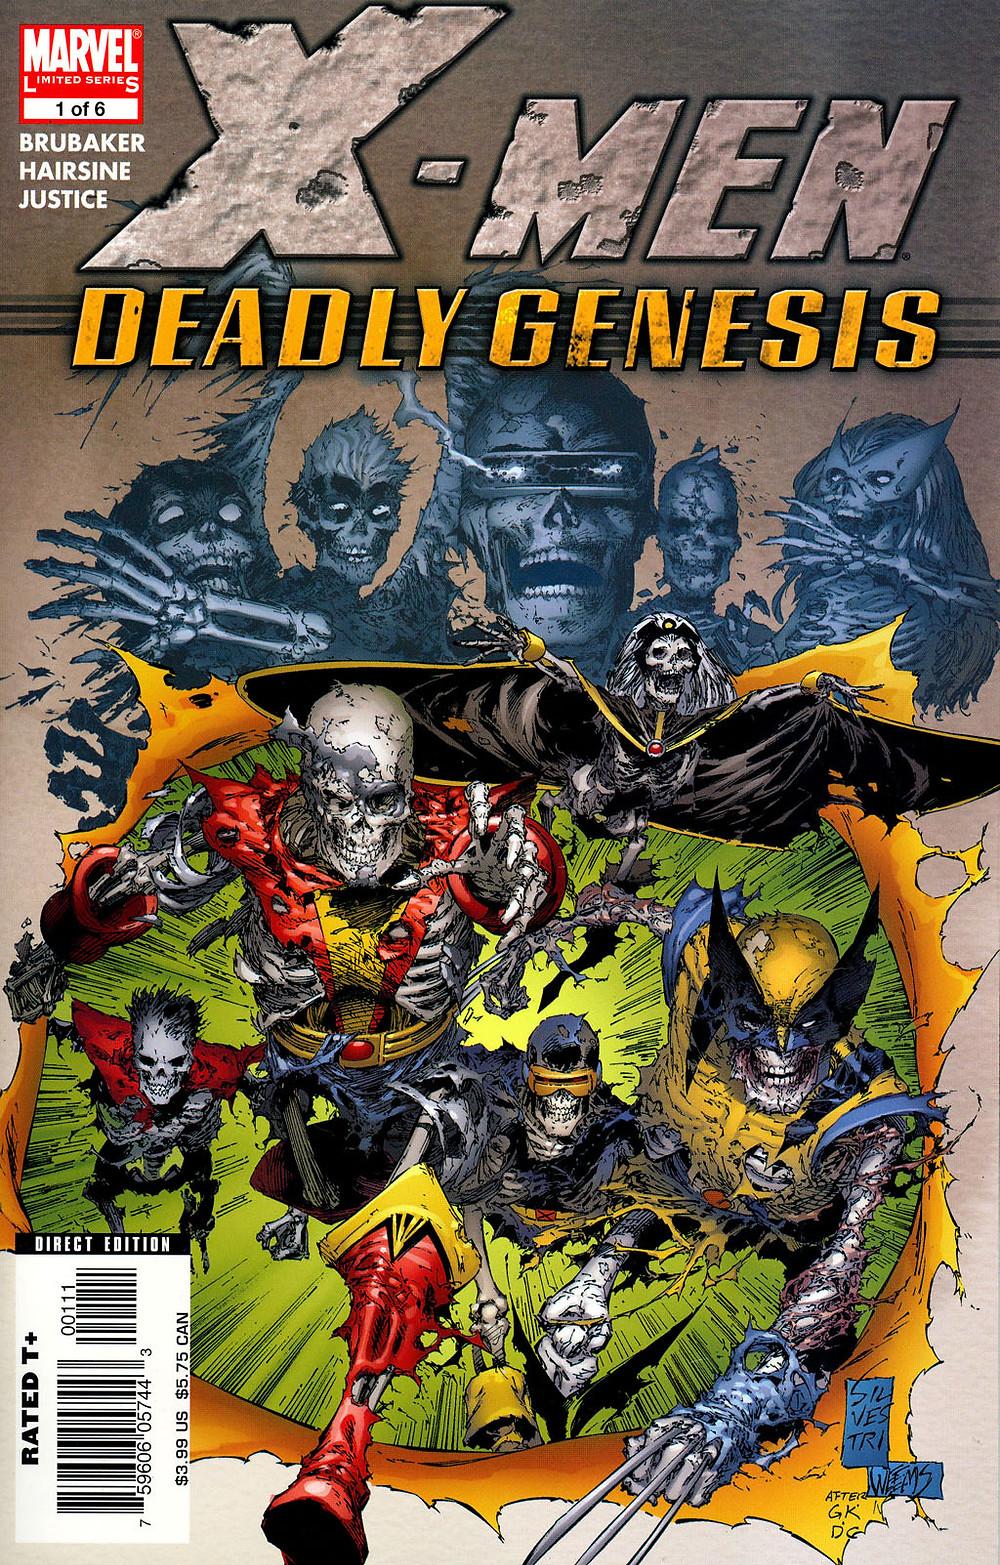 X-Men: Deadly Genesis, Vol. 1, cover, Marvel Comics, Brubaker/Hairsine/Justice